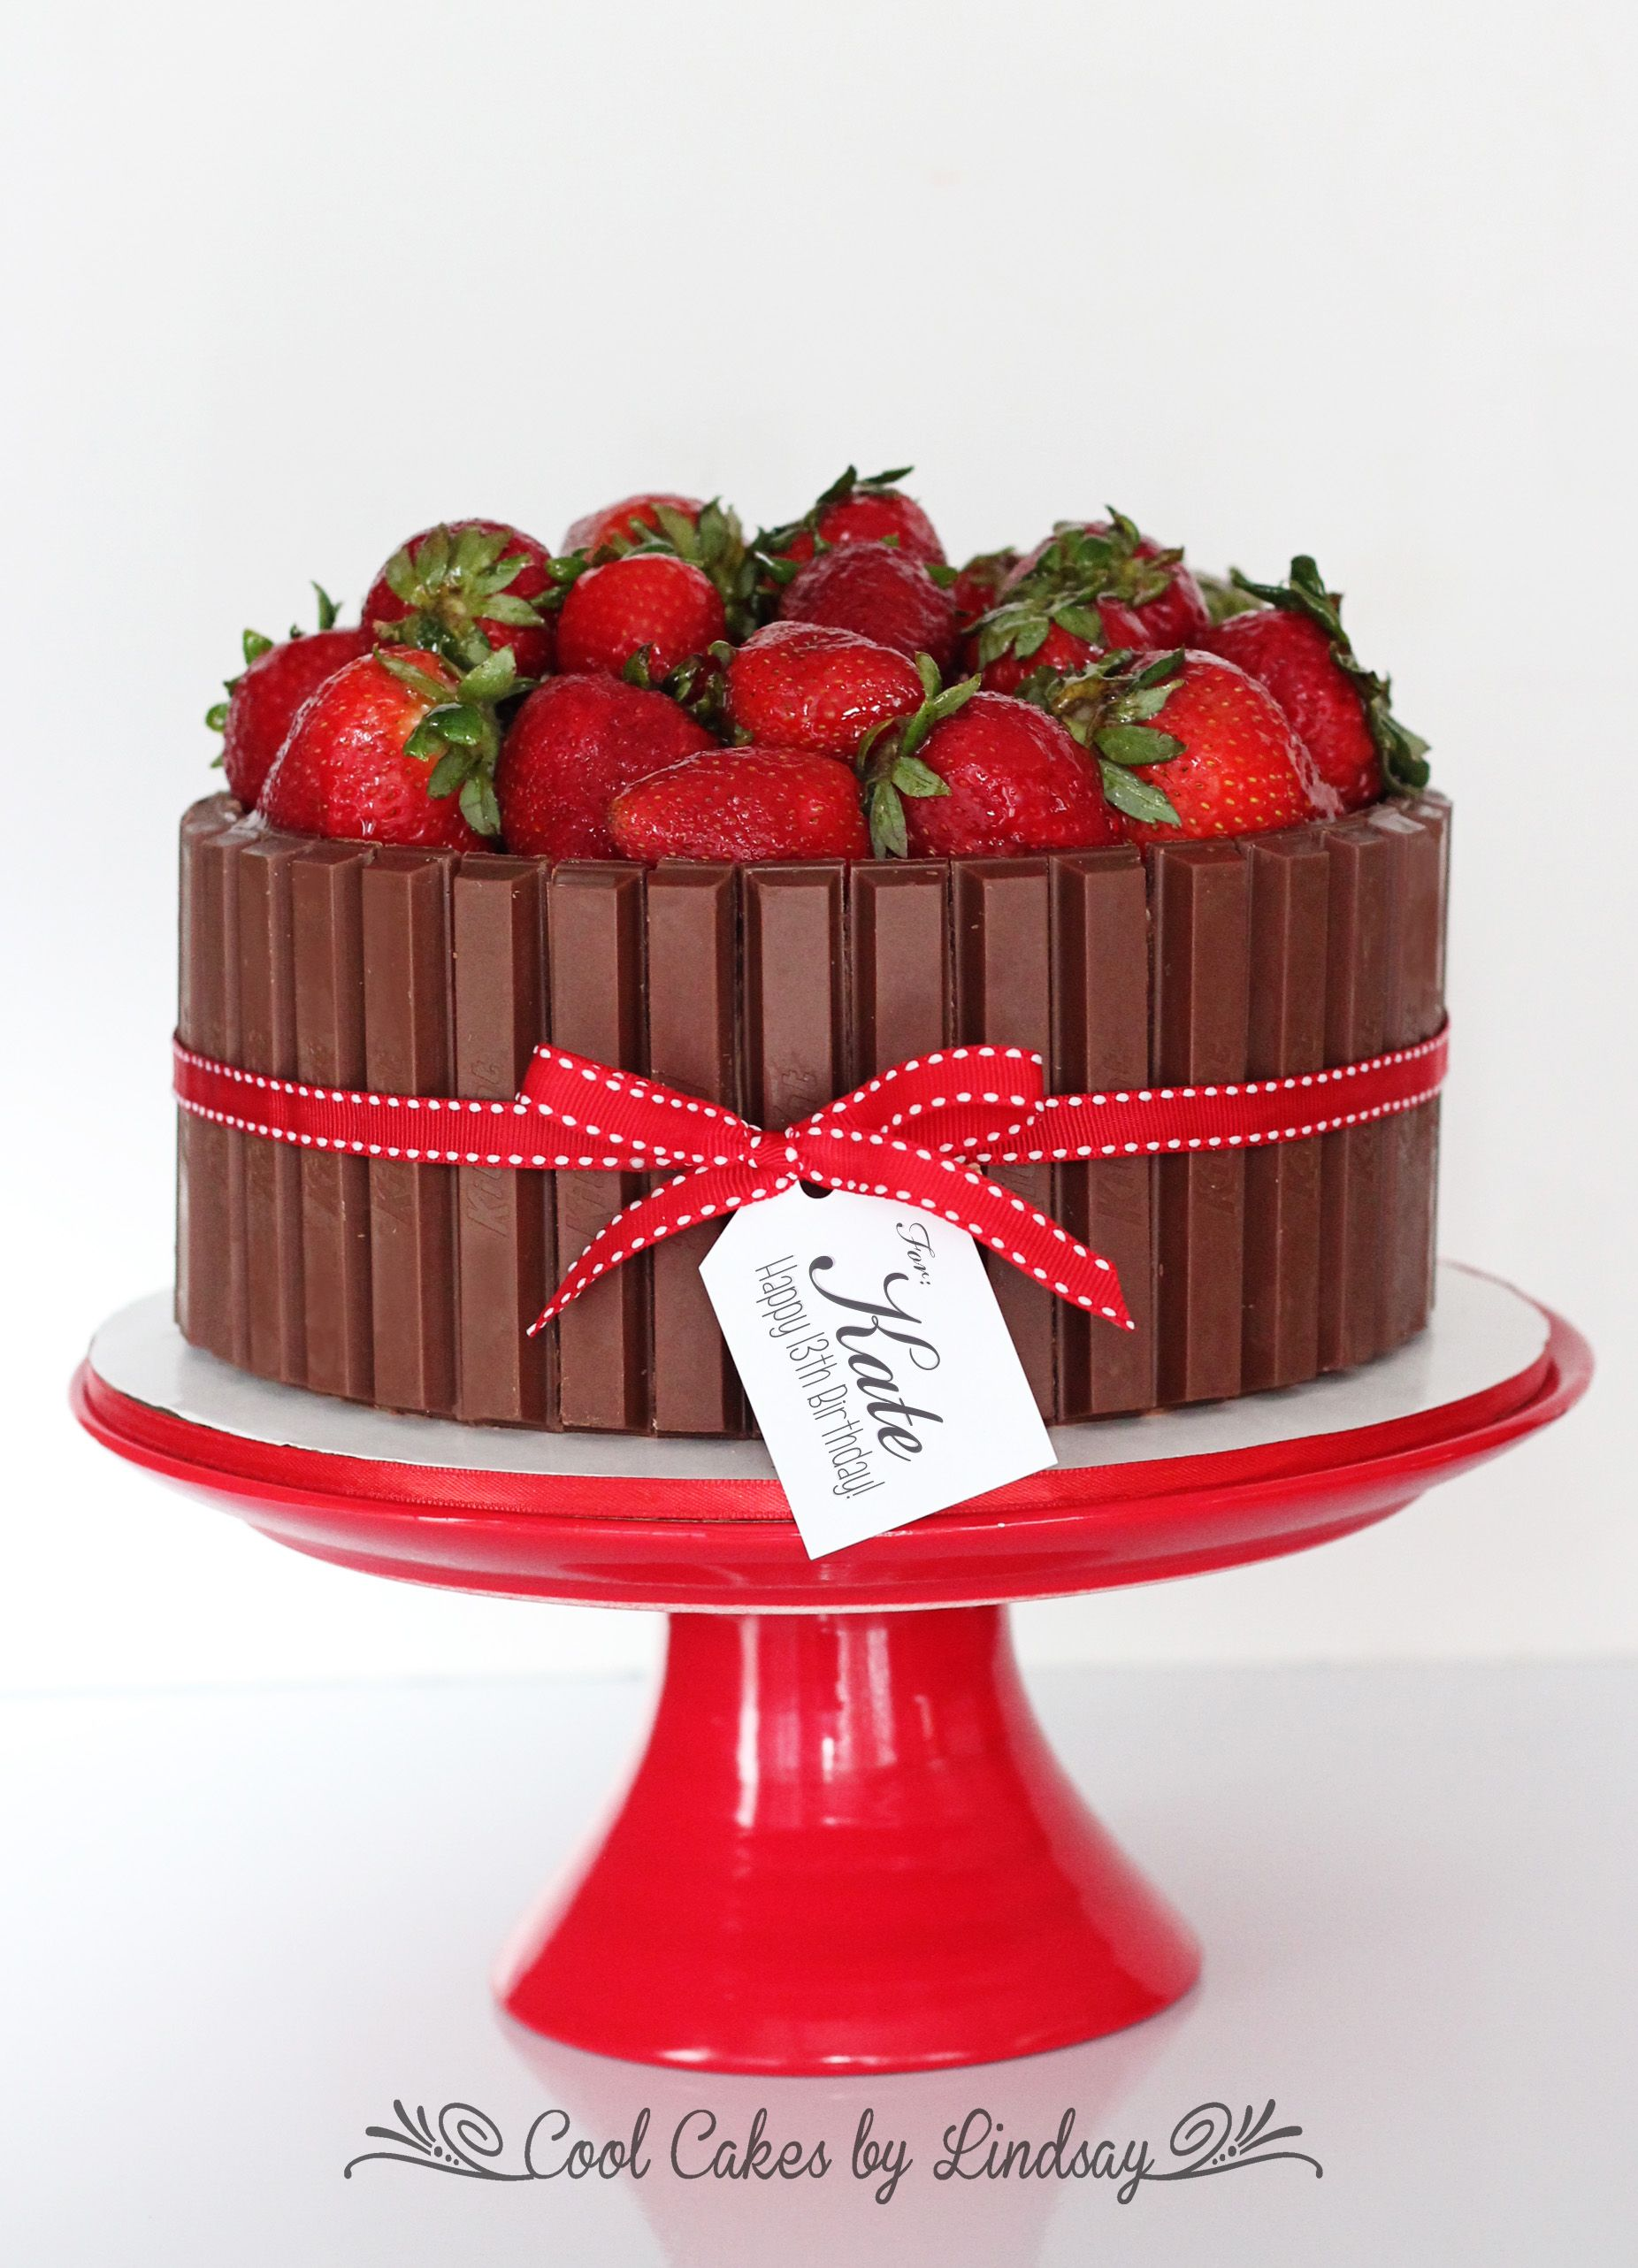 Kit Kat Cake with Strawberries Cakes Pinterest Kit kat cakes